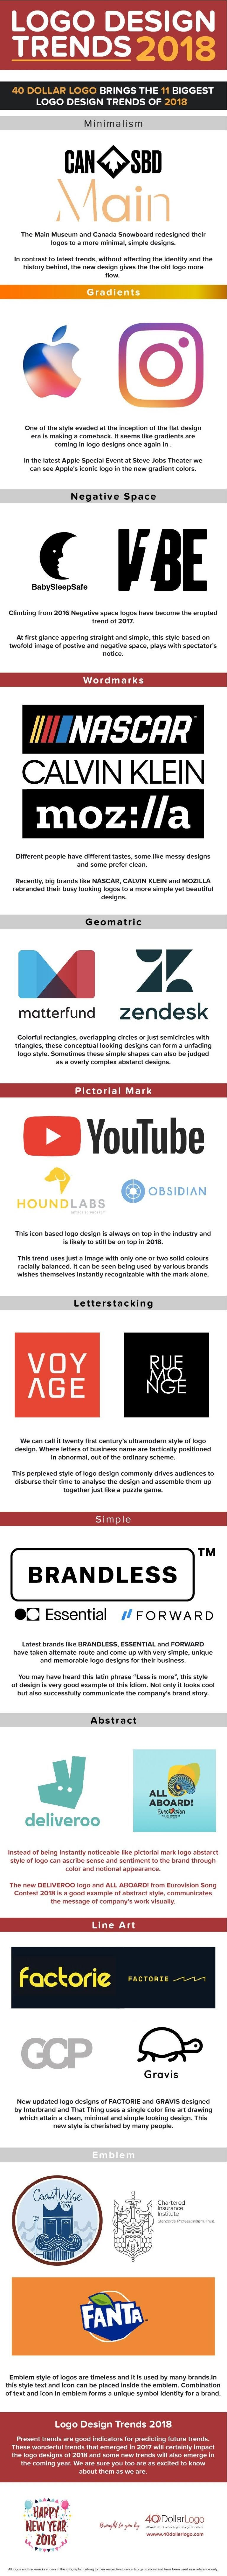 Logo Design Trends 2018 #infographic